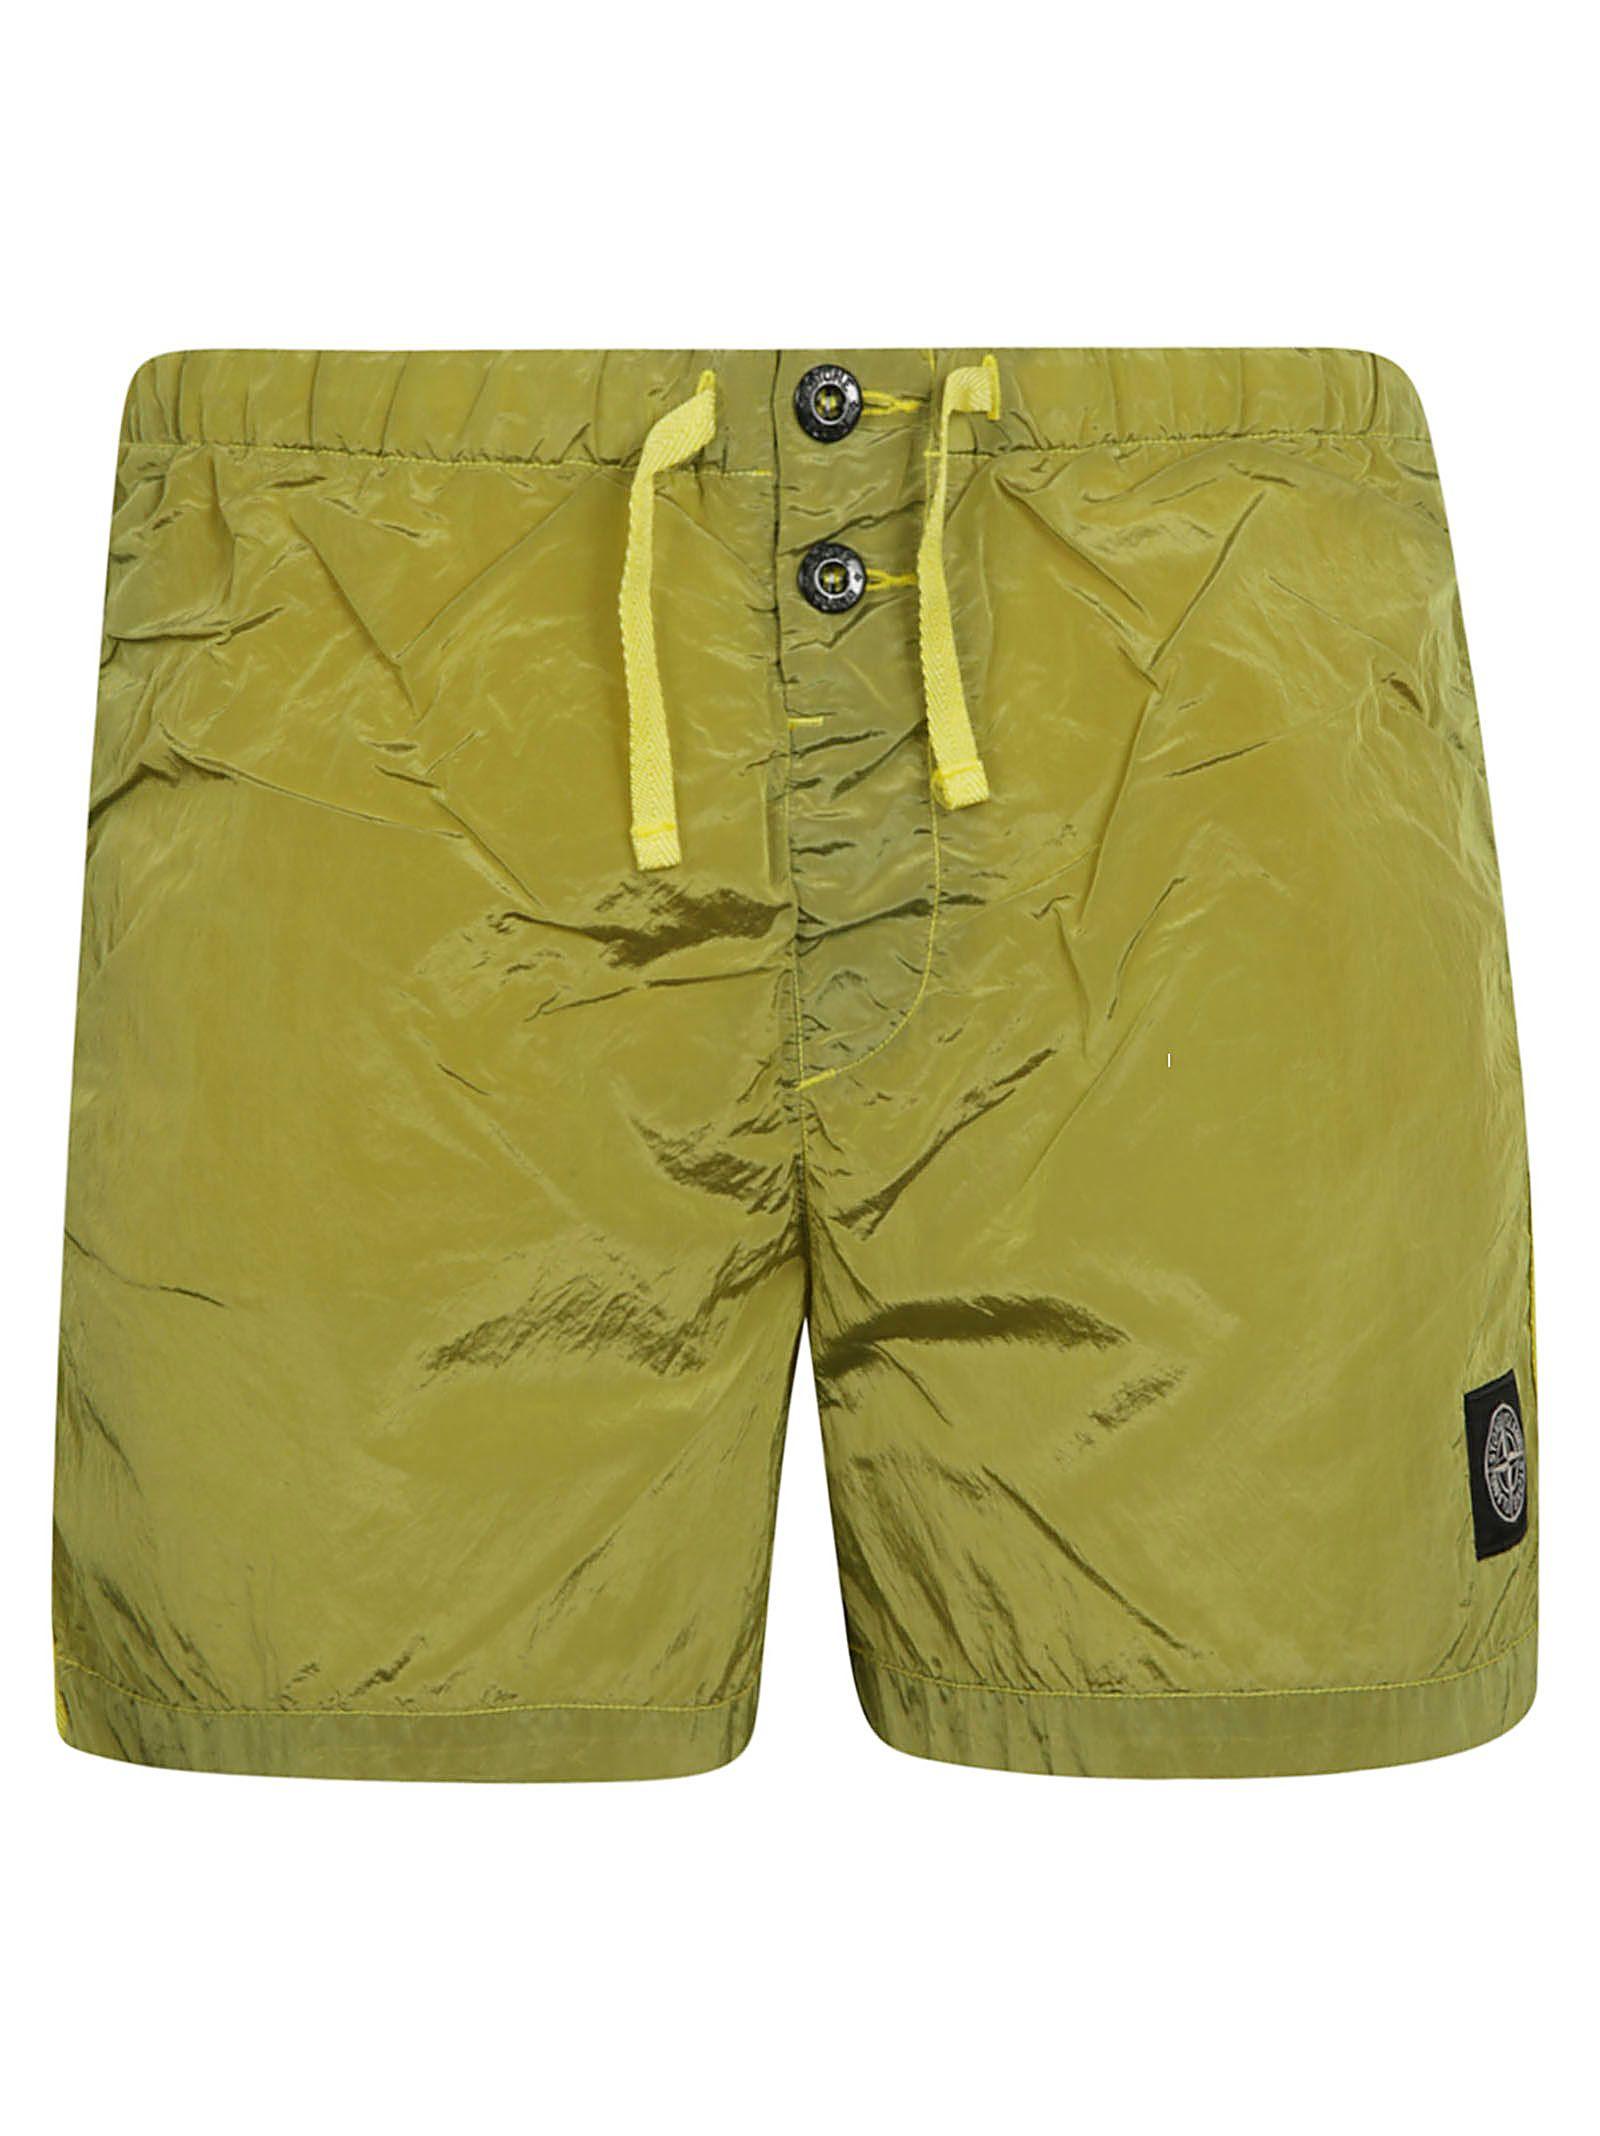 d58fa932de Stone Island Stone Island Drawstring Swim Shorts - Yellow - 10837952 ...